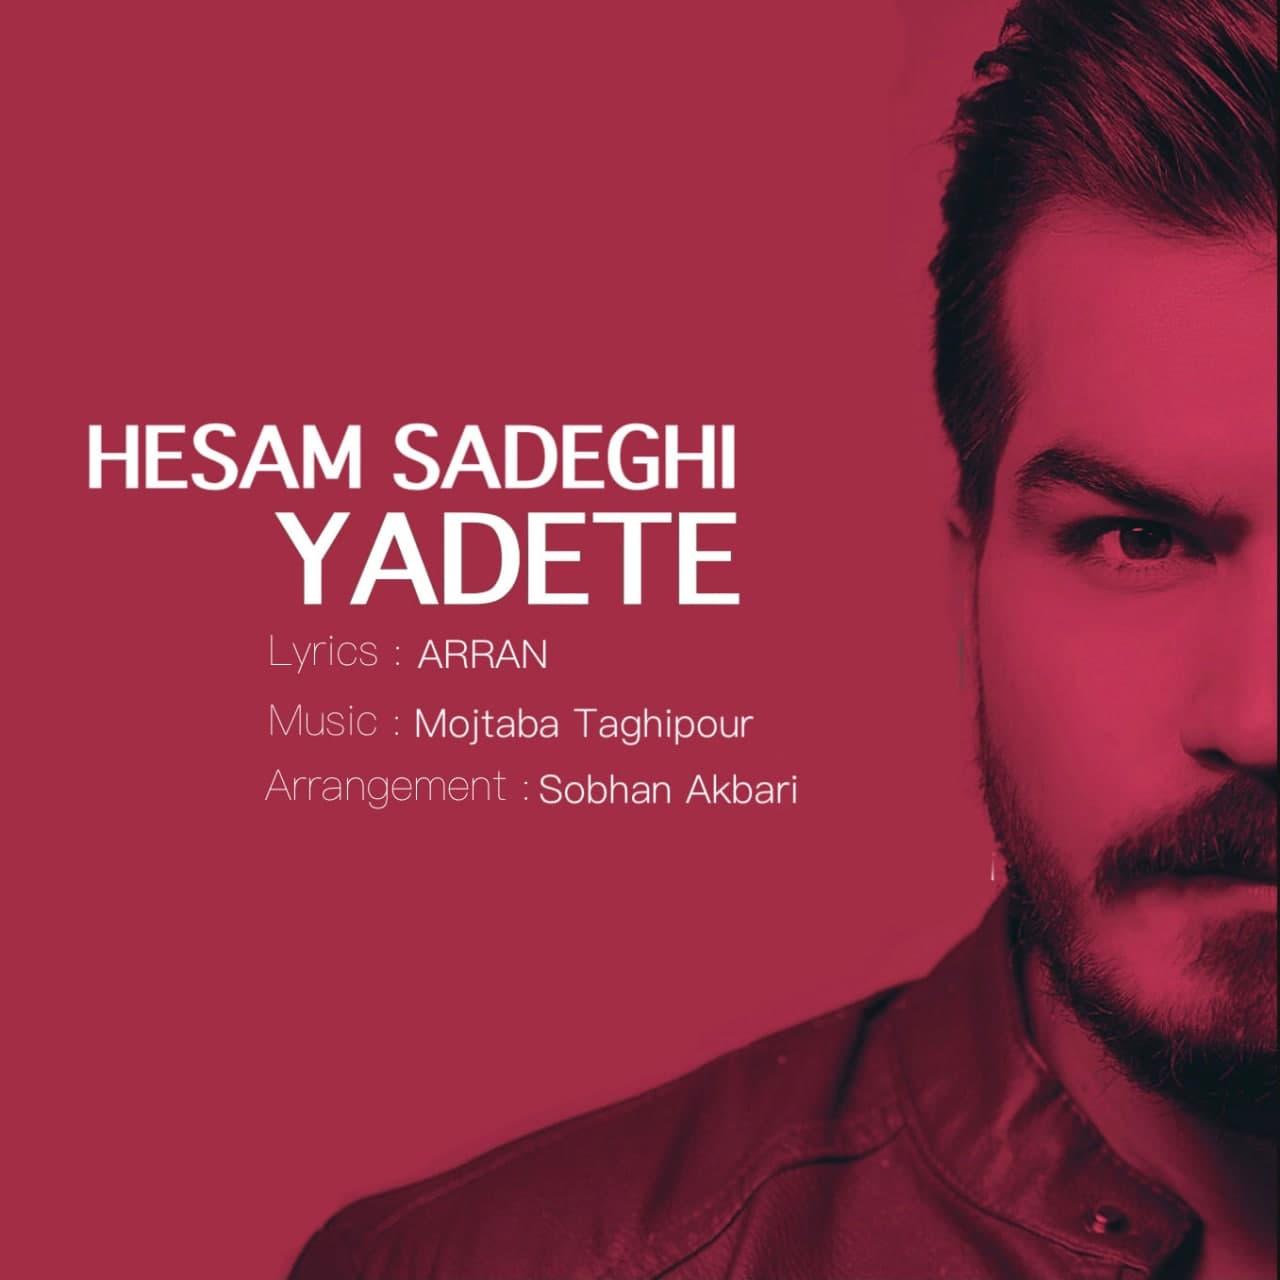 Download Ahang حسام صادقی یادته